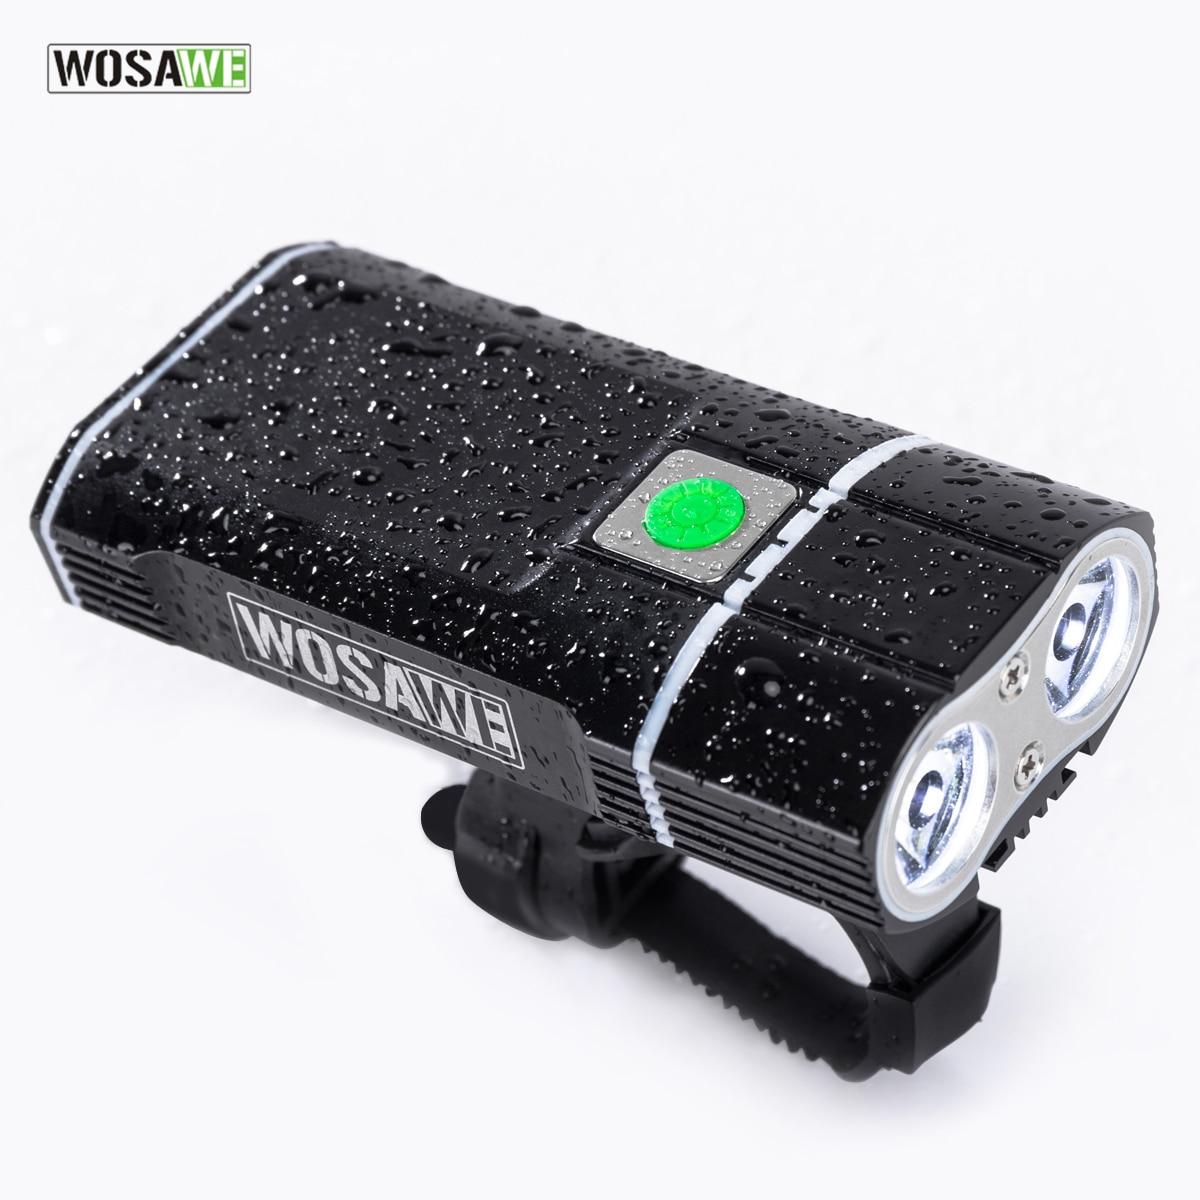 купить WOSAWE 2400 Lumens Bicycle Light with 18650 Built-in Batteries USB Rechargeable Bike Light 2-XML LED lamp Flashlight 5 modes по цене 1799.21 рублей